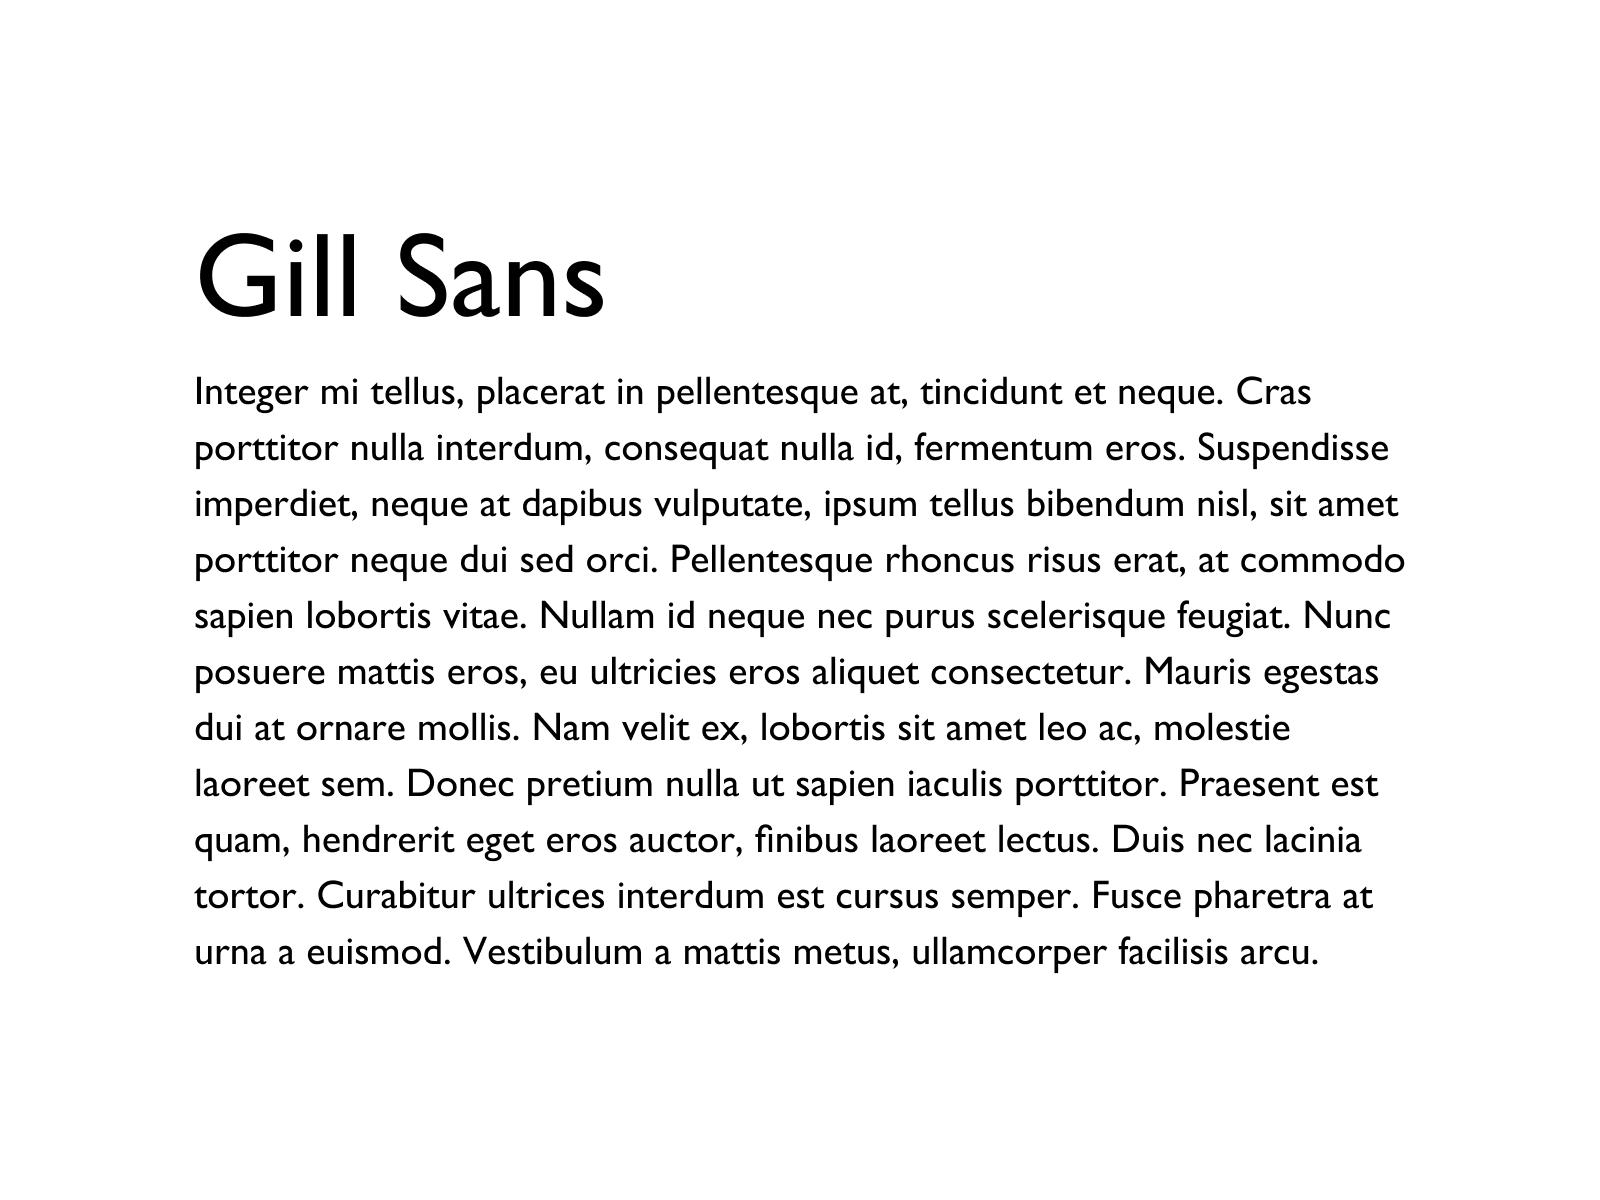 Gill Sans typeface